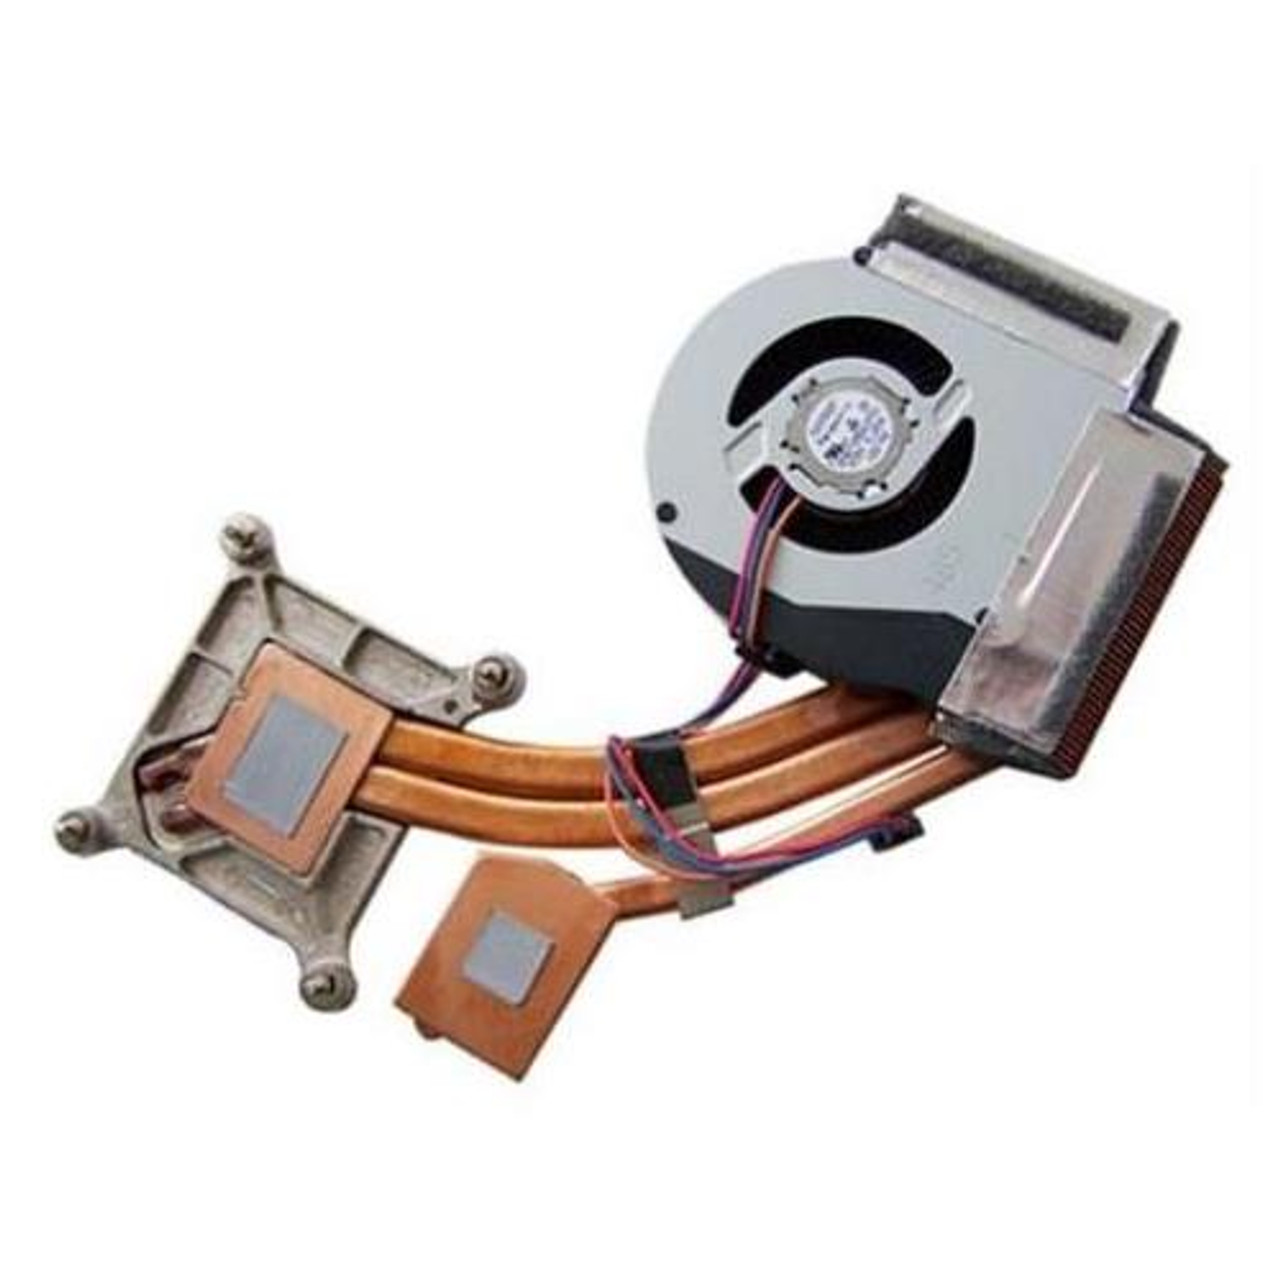 04W6921 Lenovo Cooling Fan Heatsink for ThinkPad X230 X230i